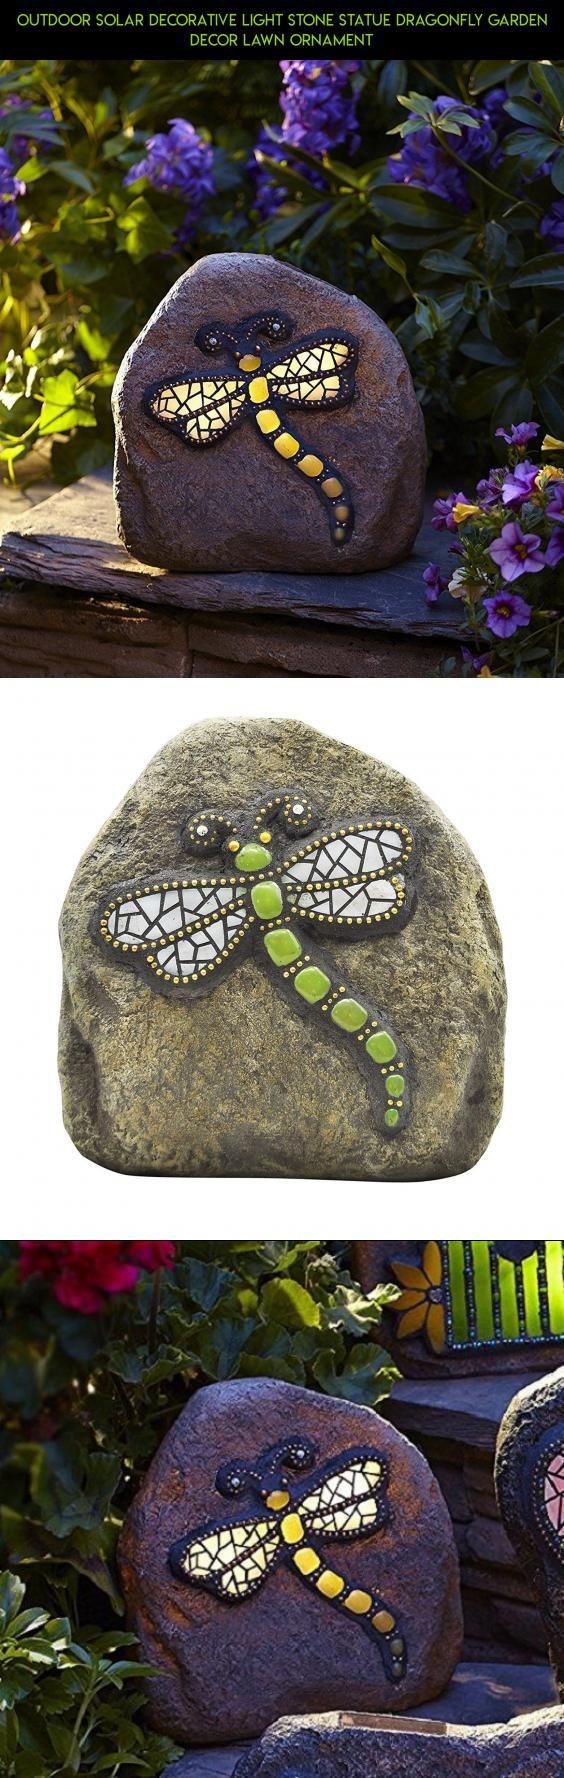 Outdoor Solar Decorative Light Stone Statue Dragonfly Garden Decor Lawn Ornament Gadgets Kit